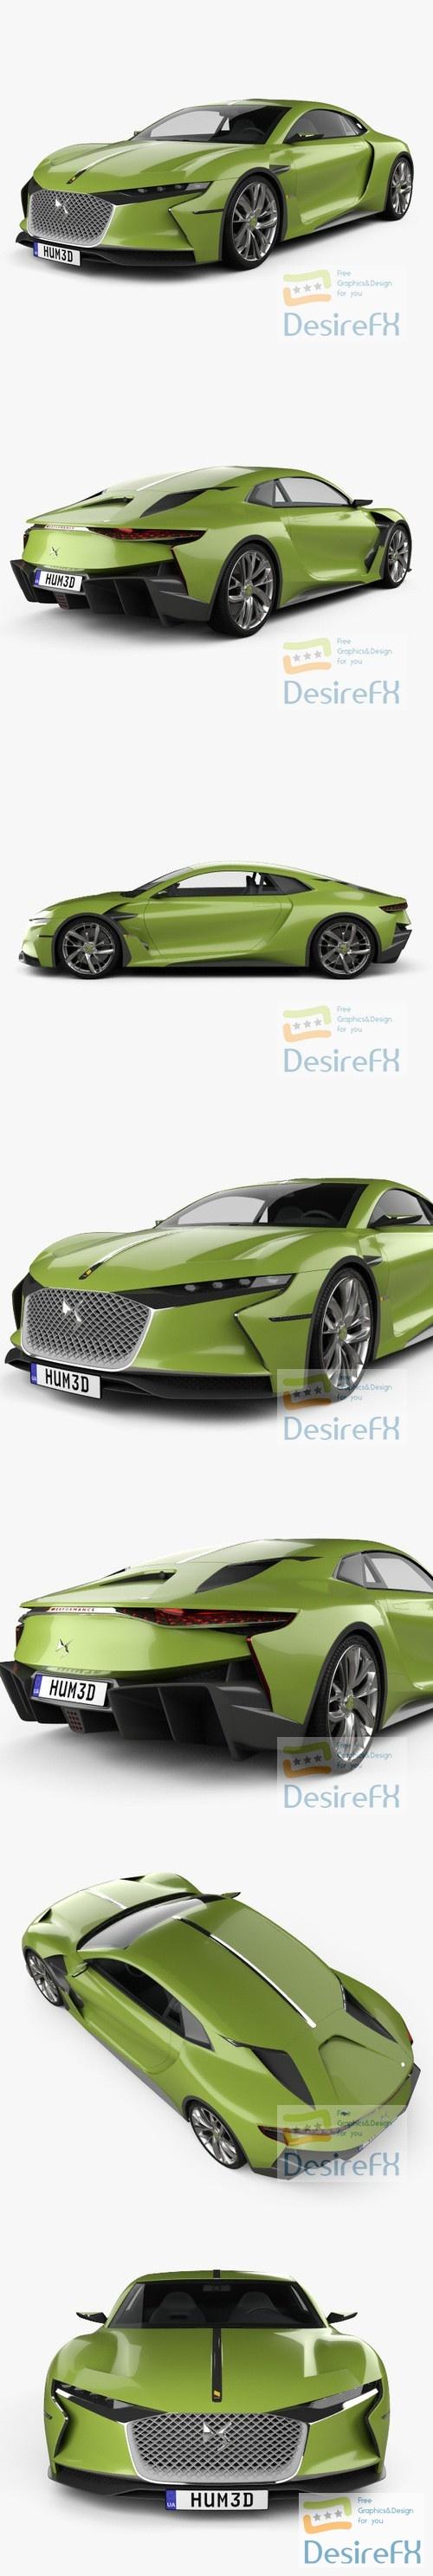 DS E-Tense 2016 3D Model